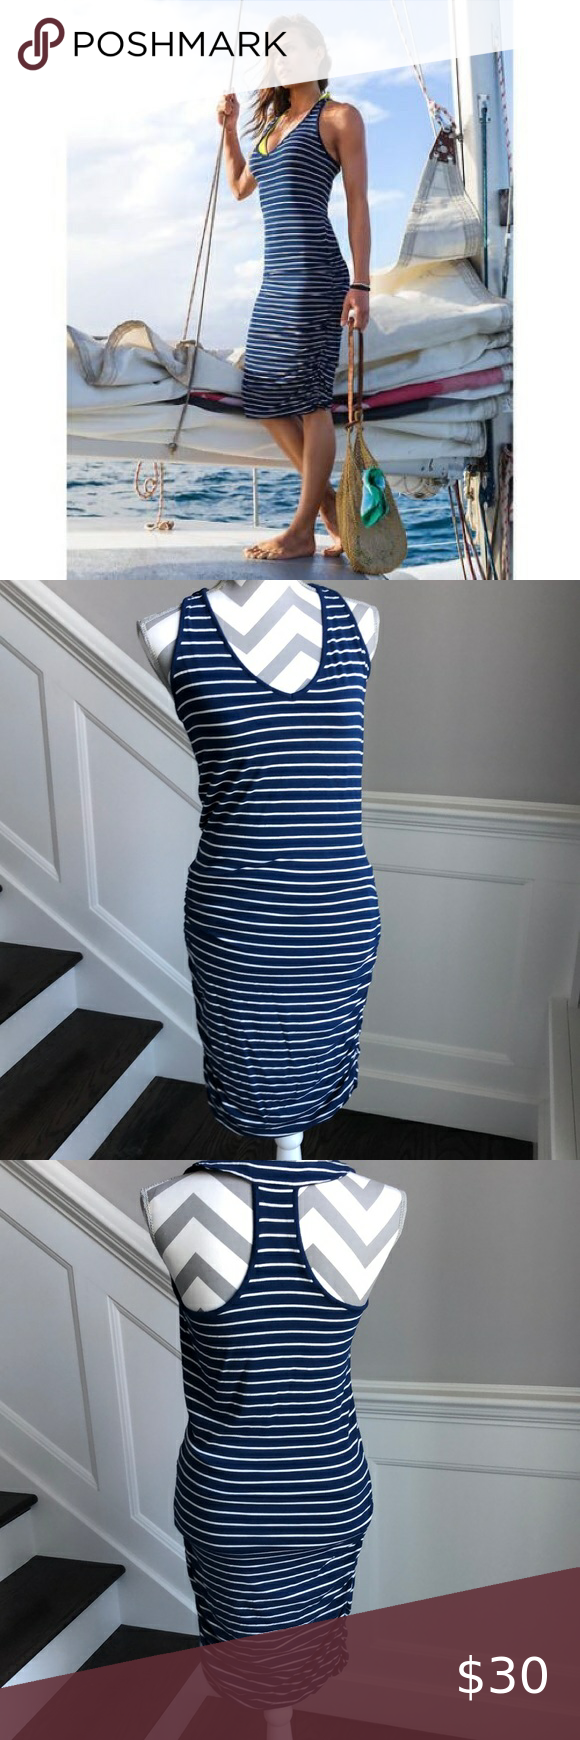 Athleta Blue Striped Racerback Tee Dress Small Tee Dress Dresses Clothes Design [ 1740 x 580 Pixel ]